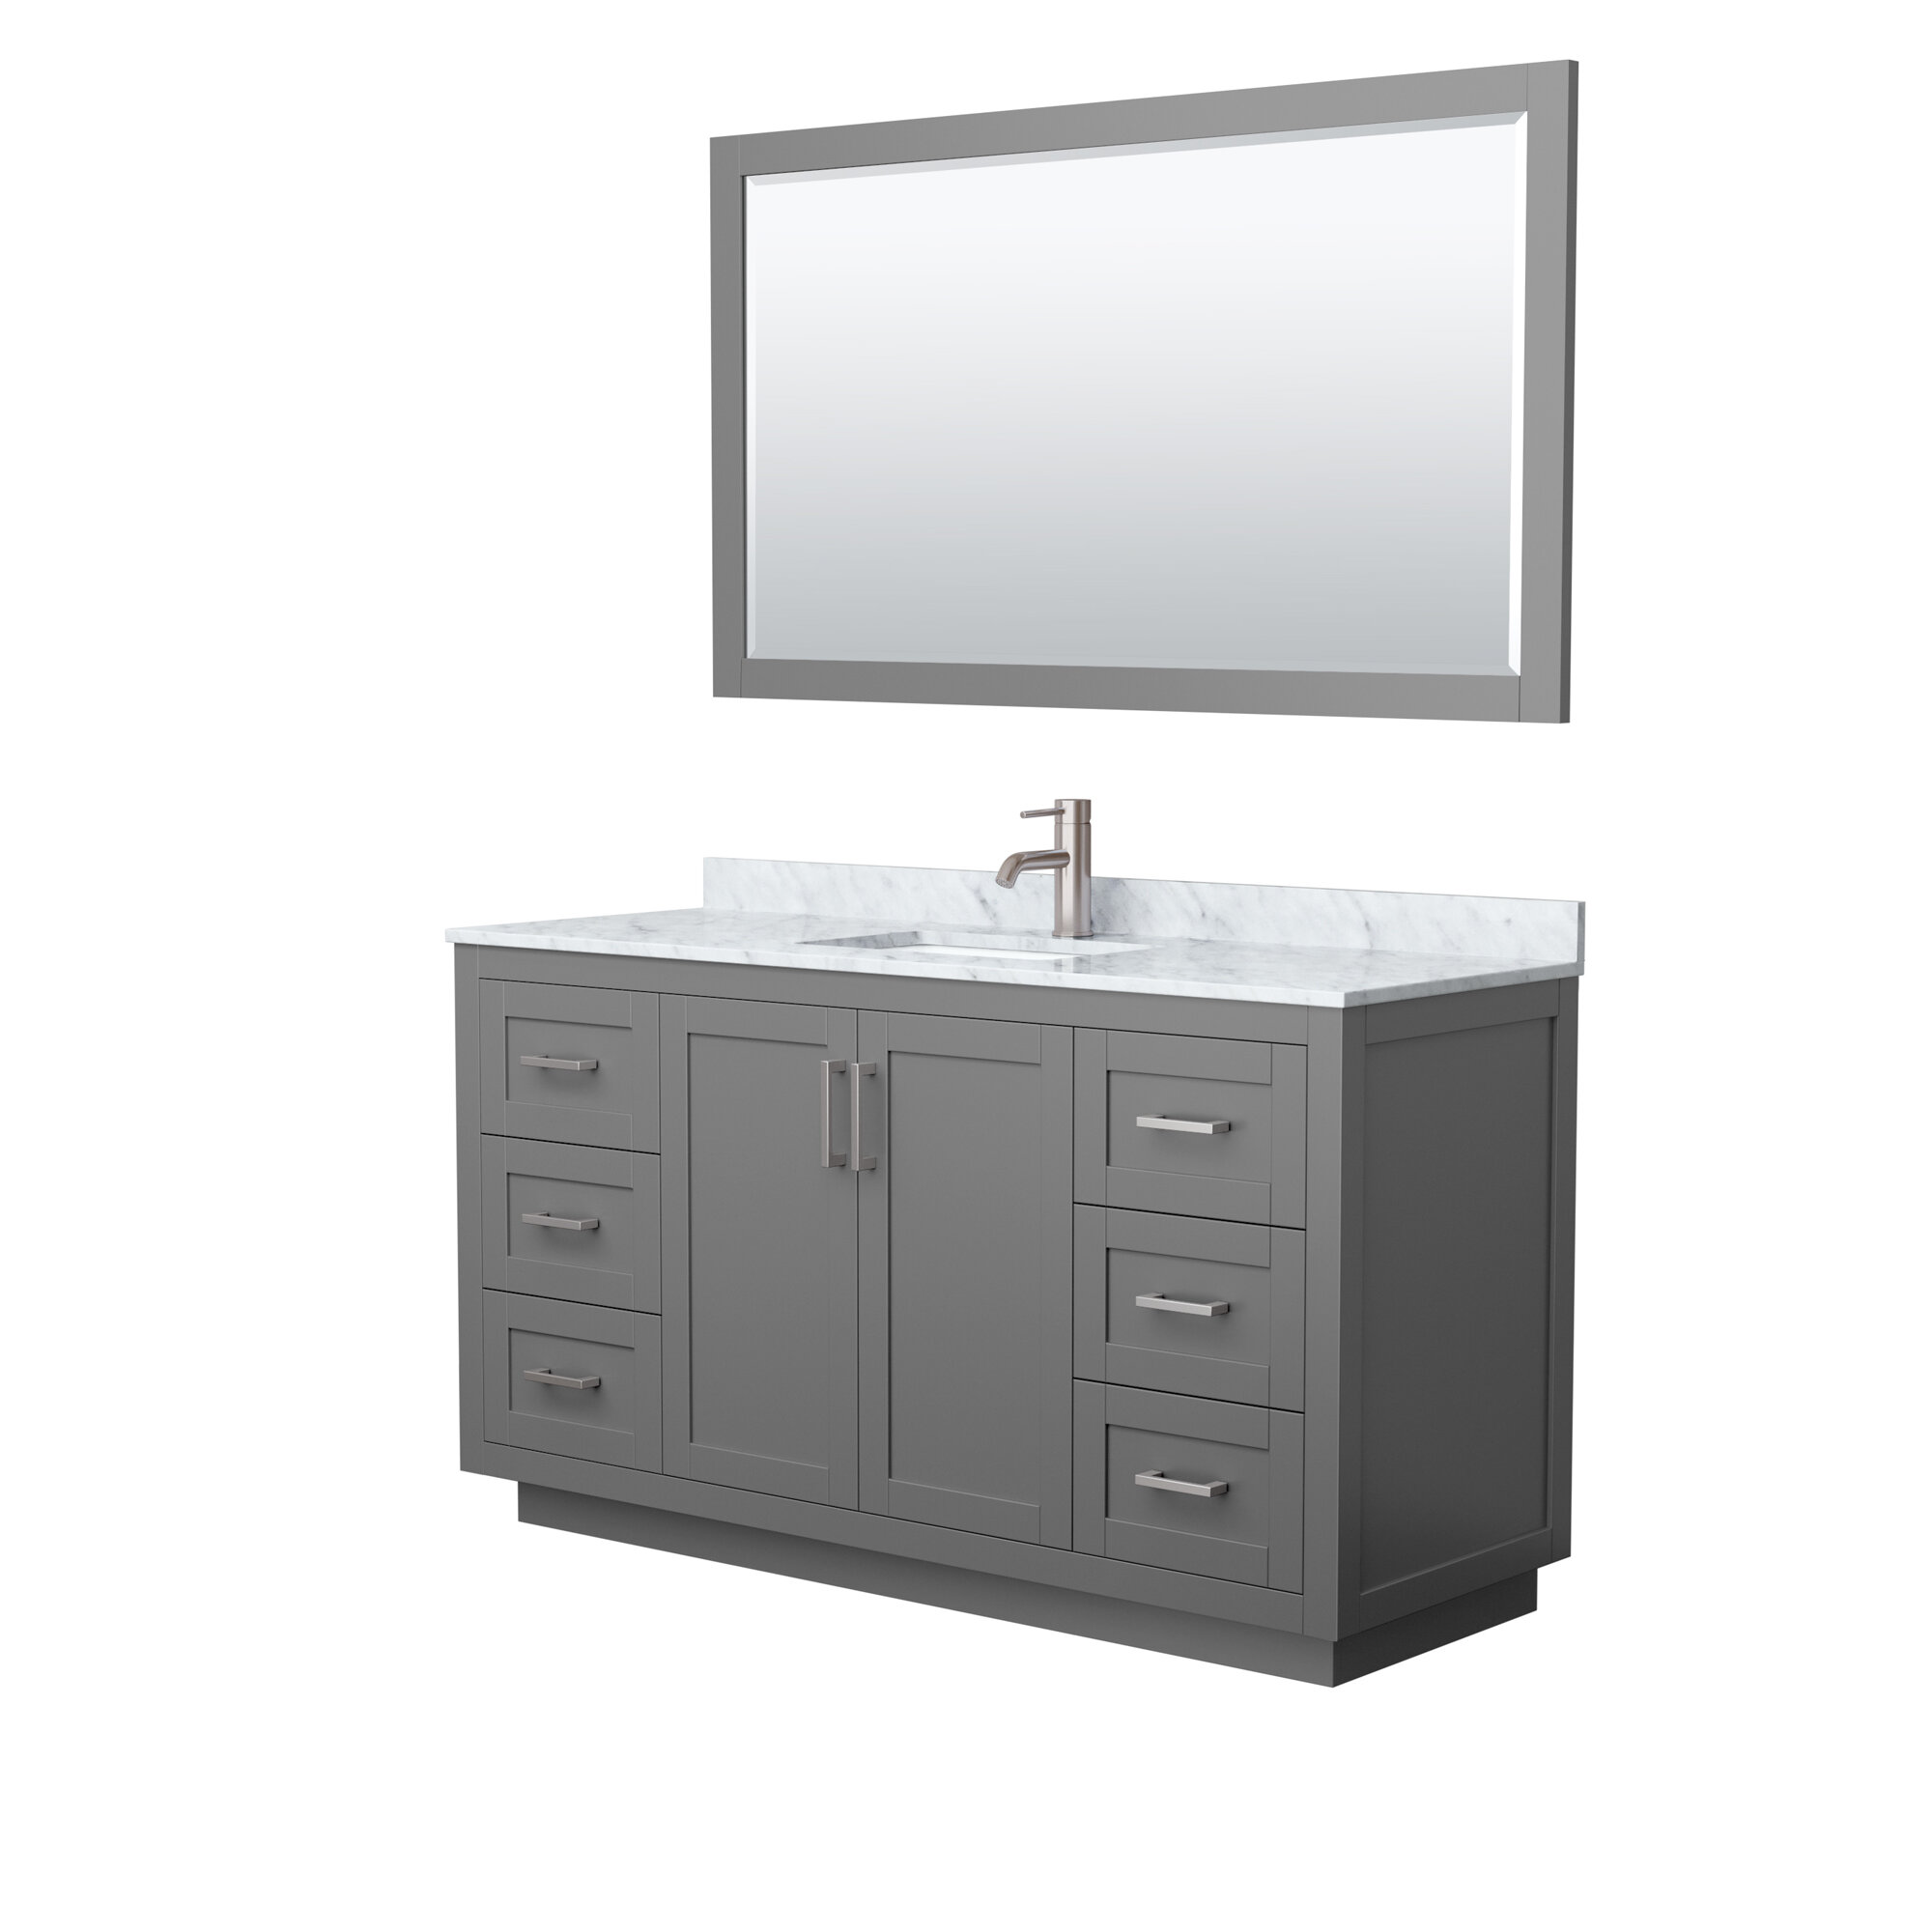 Wyndham Collection Miranda 60 Inch Single Bathroom Vanity In White White Carrara Marble Countertop Undermount Square Sink Brushed Gold Trim 58 Inch Mirror B9 Wayfair